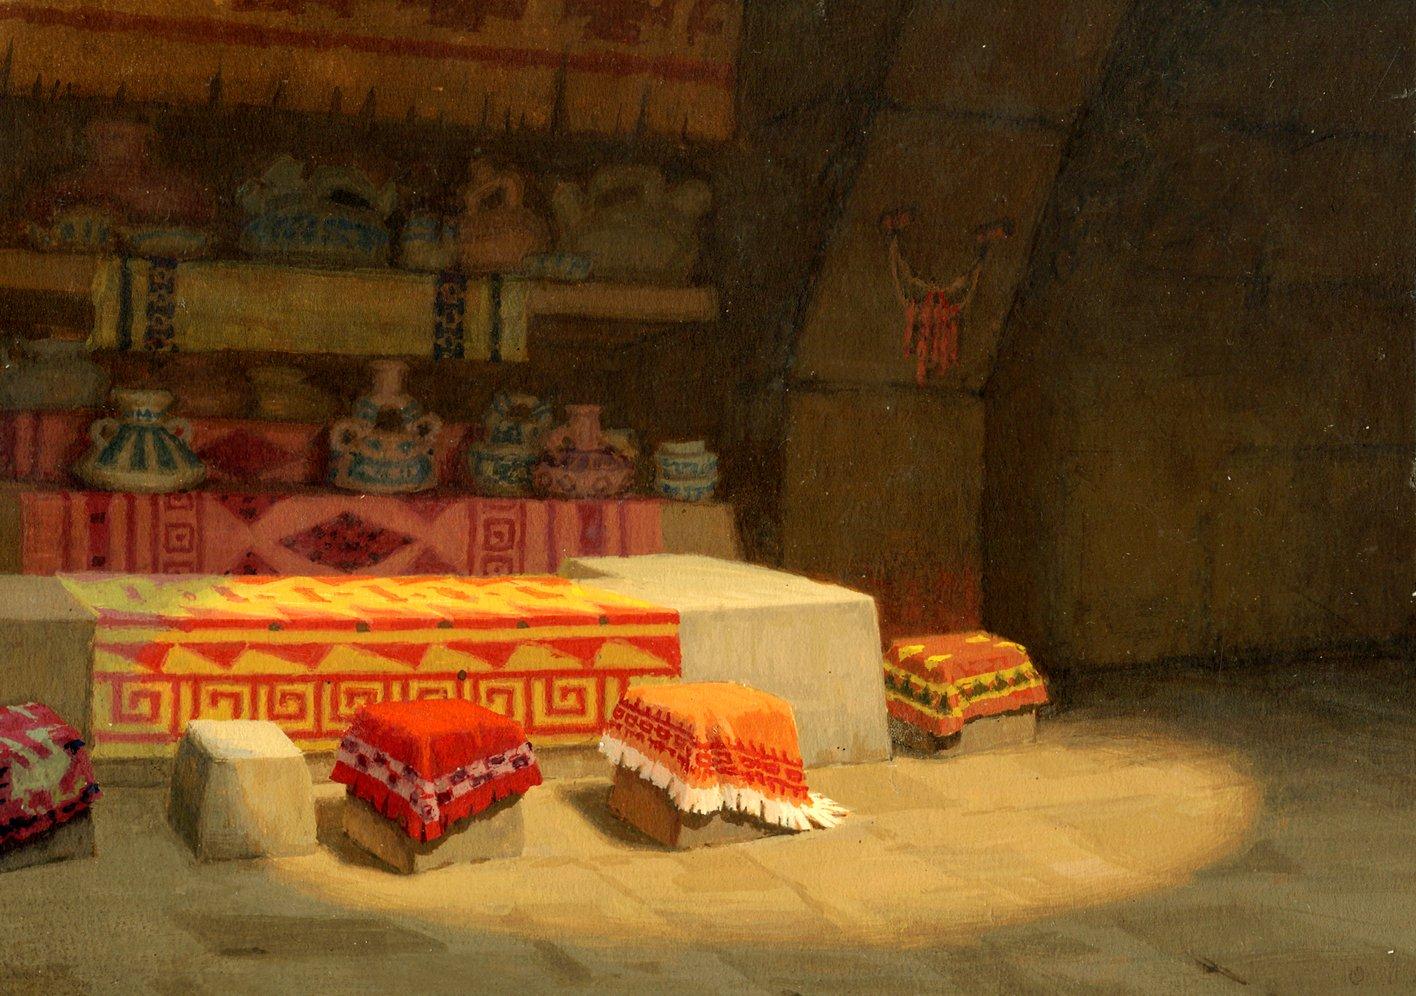 Kuzco, l'Empereur Mégalo [Walt Disney -2001] - Page 6 EWZLUmZXsAQ4fGe?format=jpg&name=large